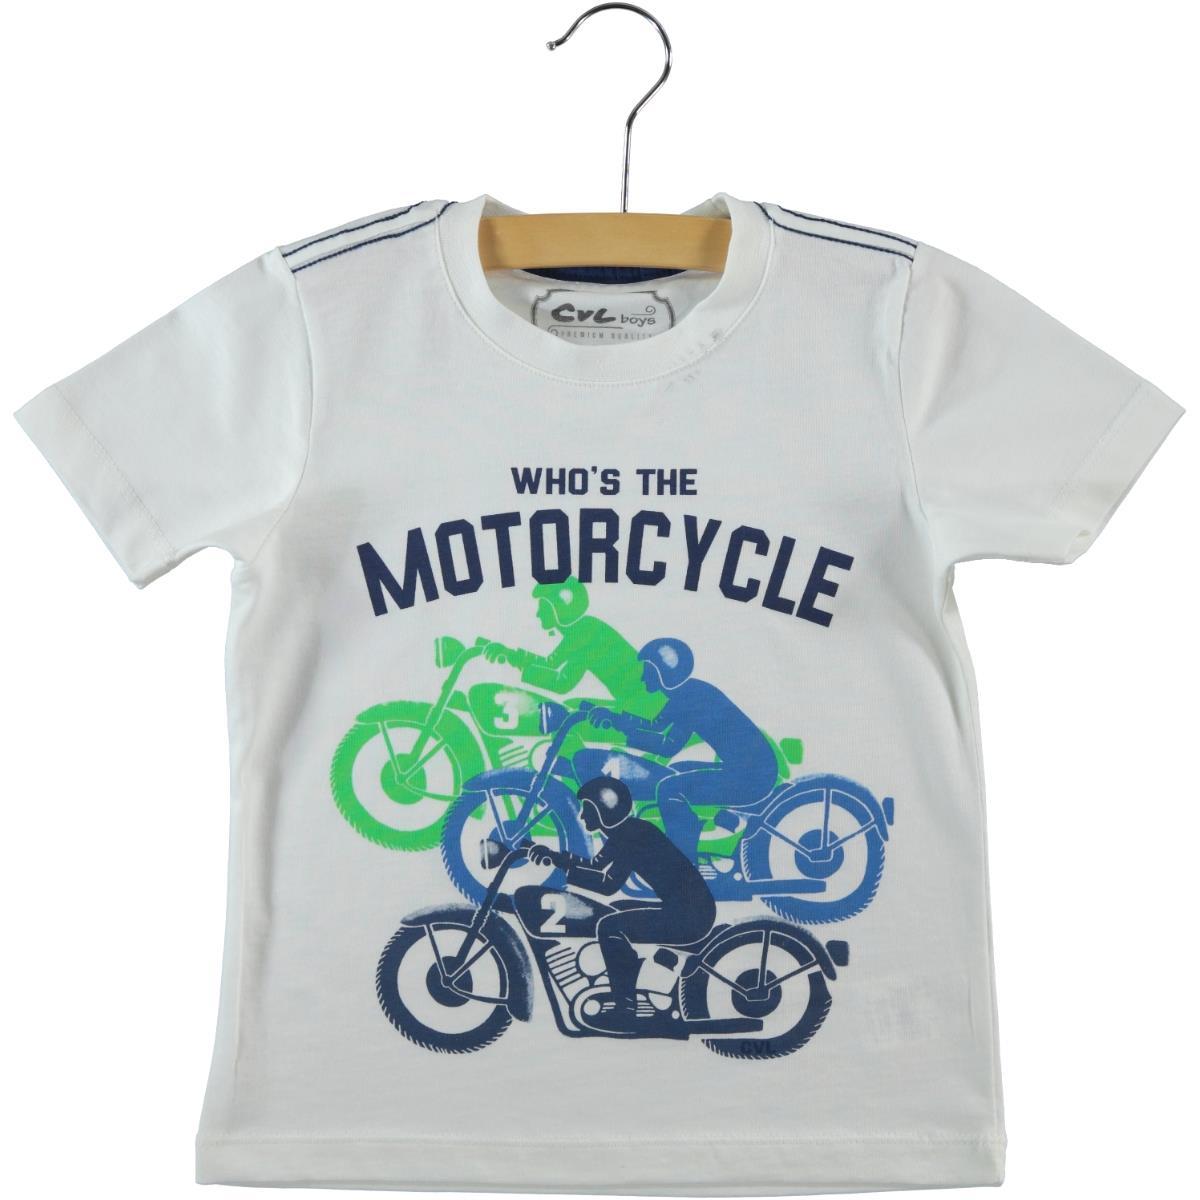 Cvl Boy T-Shirt Ecru 2-5 Years